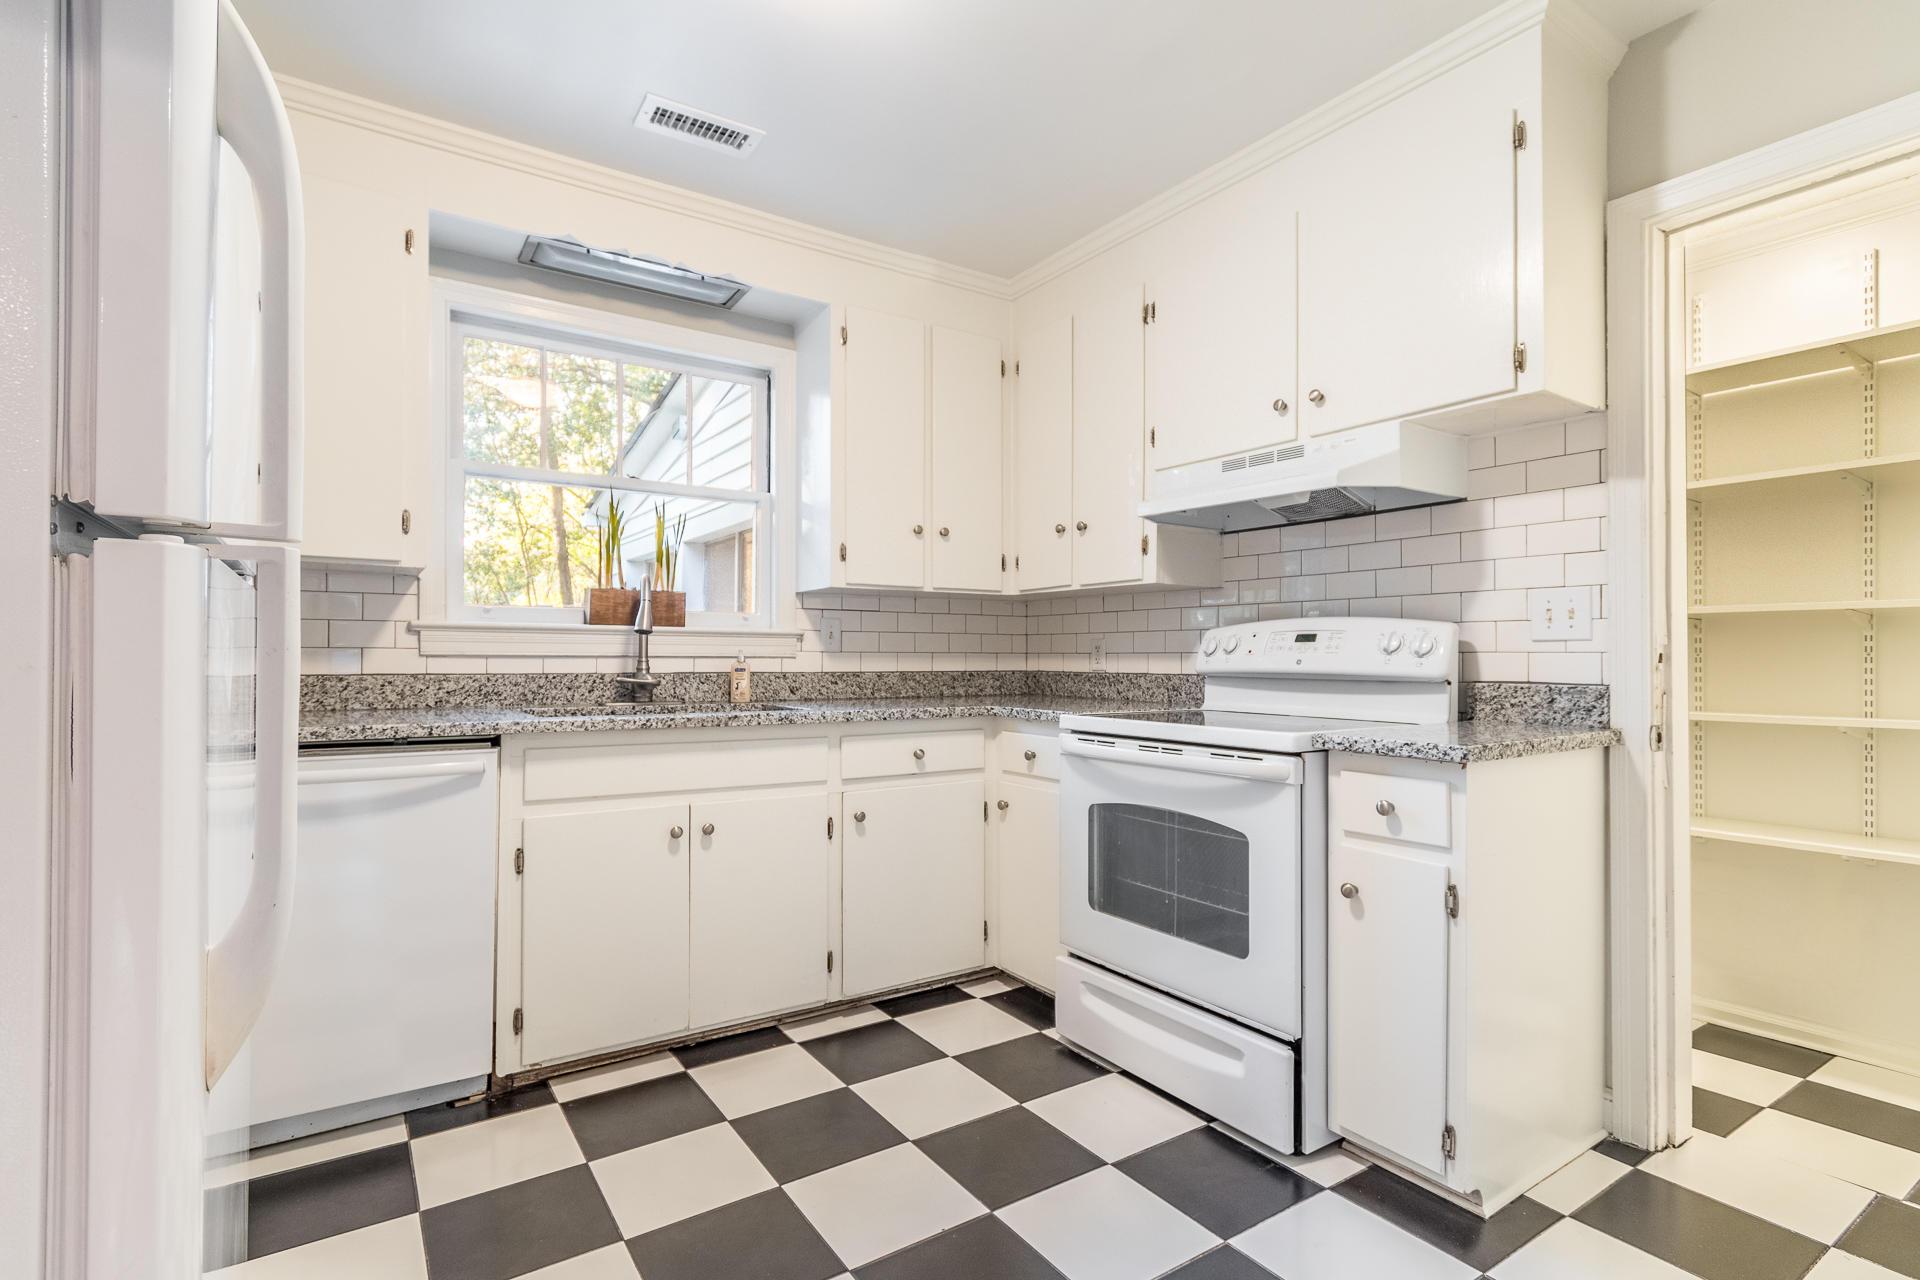 Edgewood Gardens Homes For Sale - 507 Risher, Charleston, SC - 7